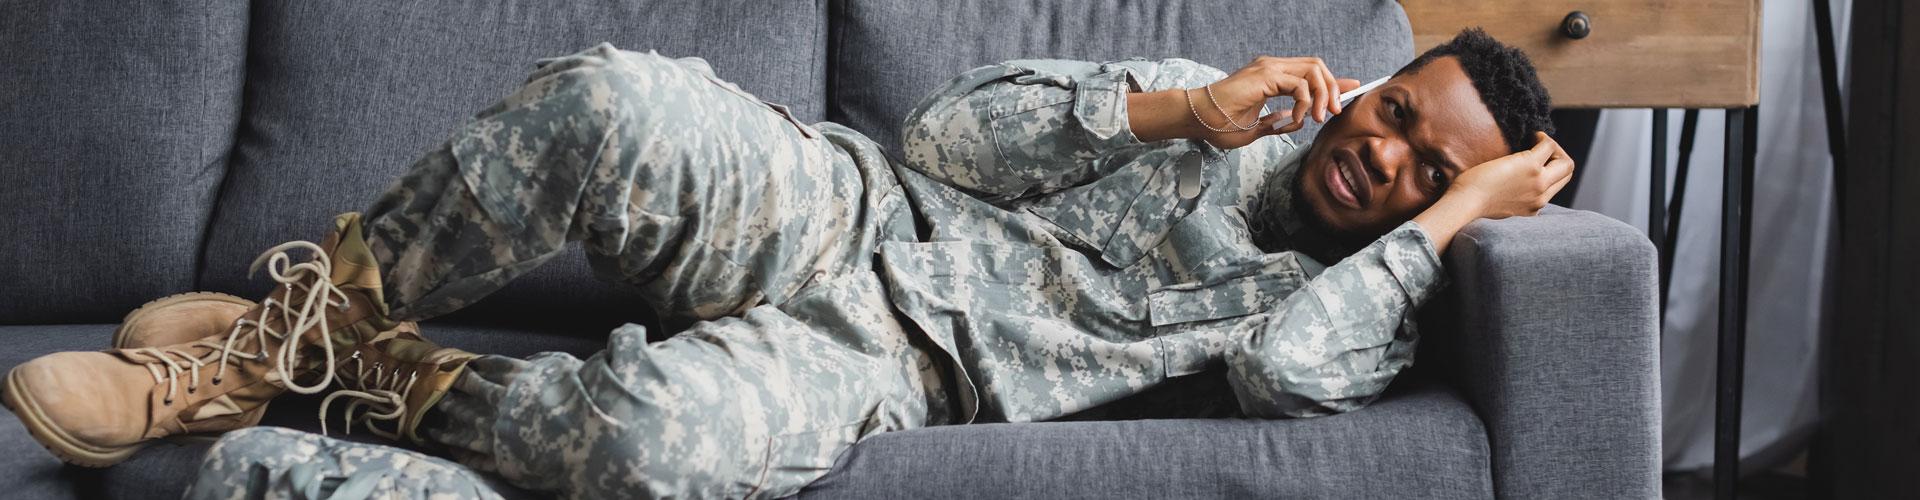 Veterans using CBD